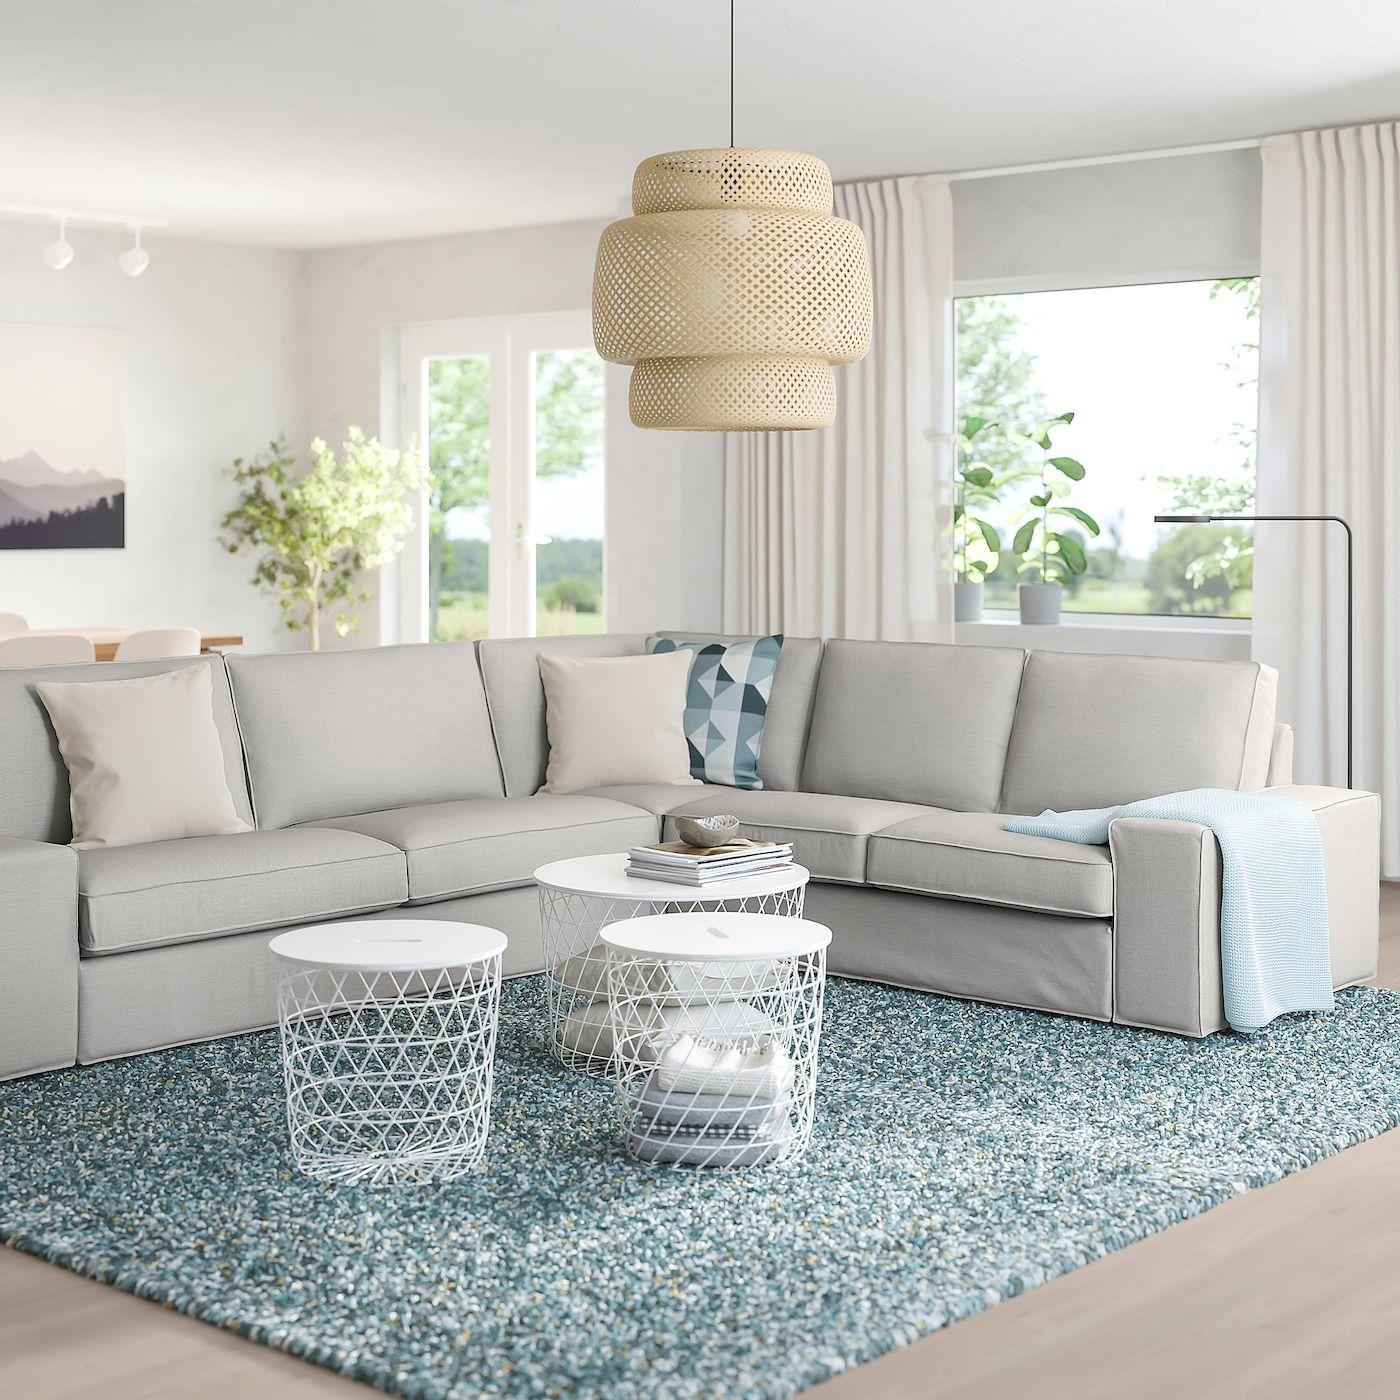 Ikea Kivik Ecksofa 5 Sitzig Orrsta Hellgrau In 2020 3er Sofa Sofa Bequemes Sofa